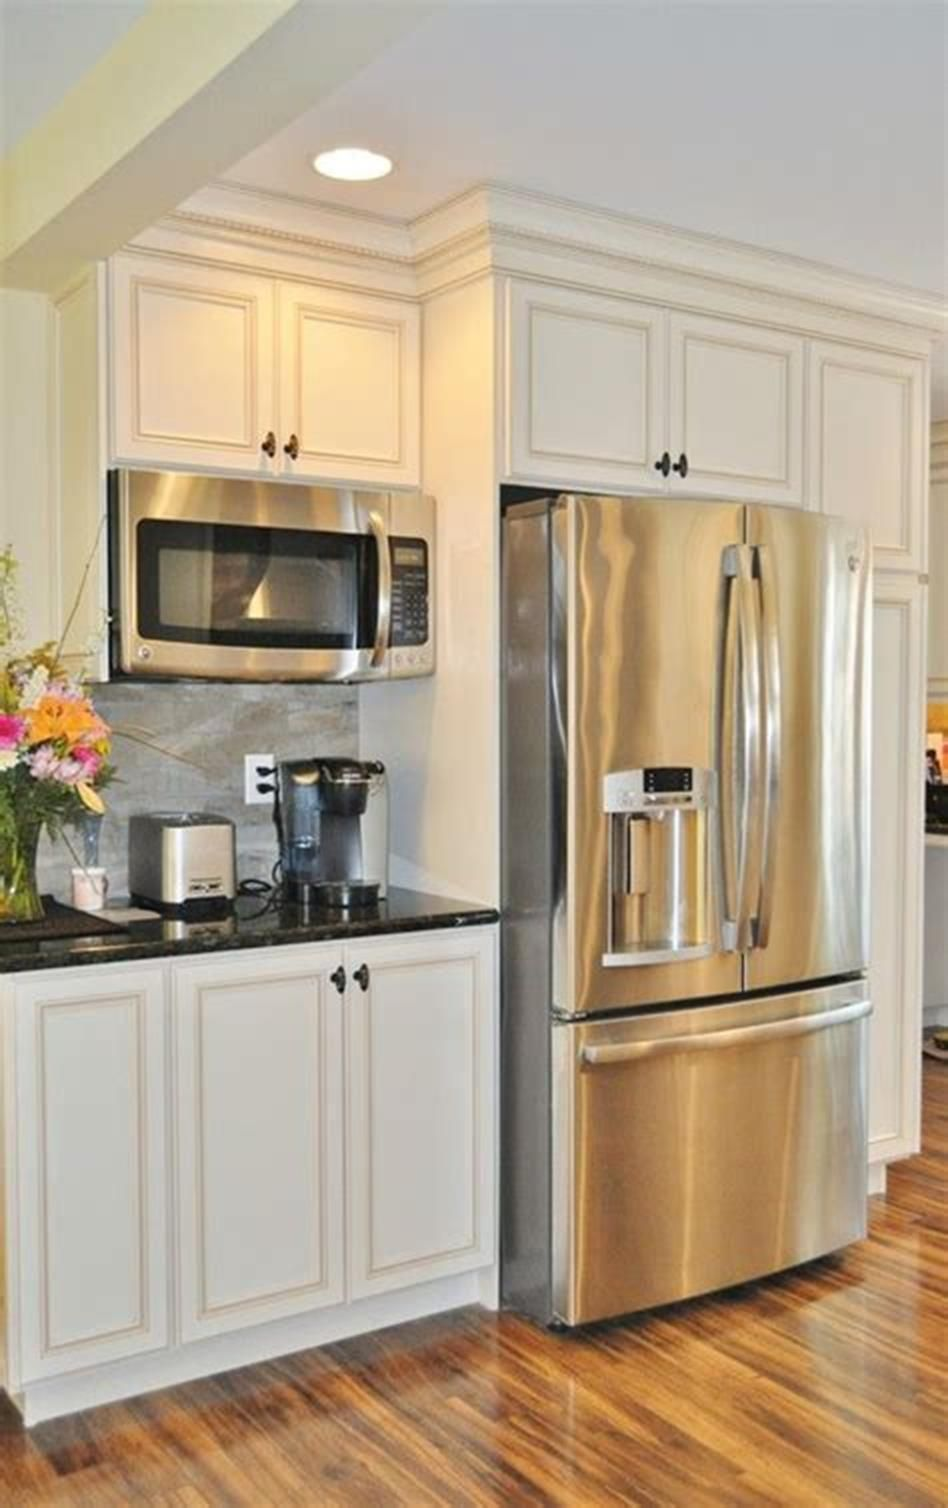 40 Adorable Small Kitchen Wall Storage Ideas You Will Love 60 Kitchen Wall Storage New Kitchen Cabinets Kitchen Design Small